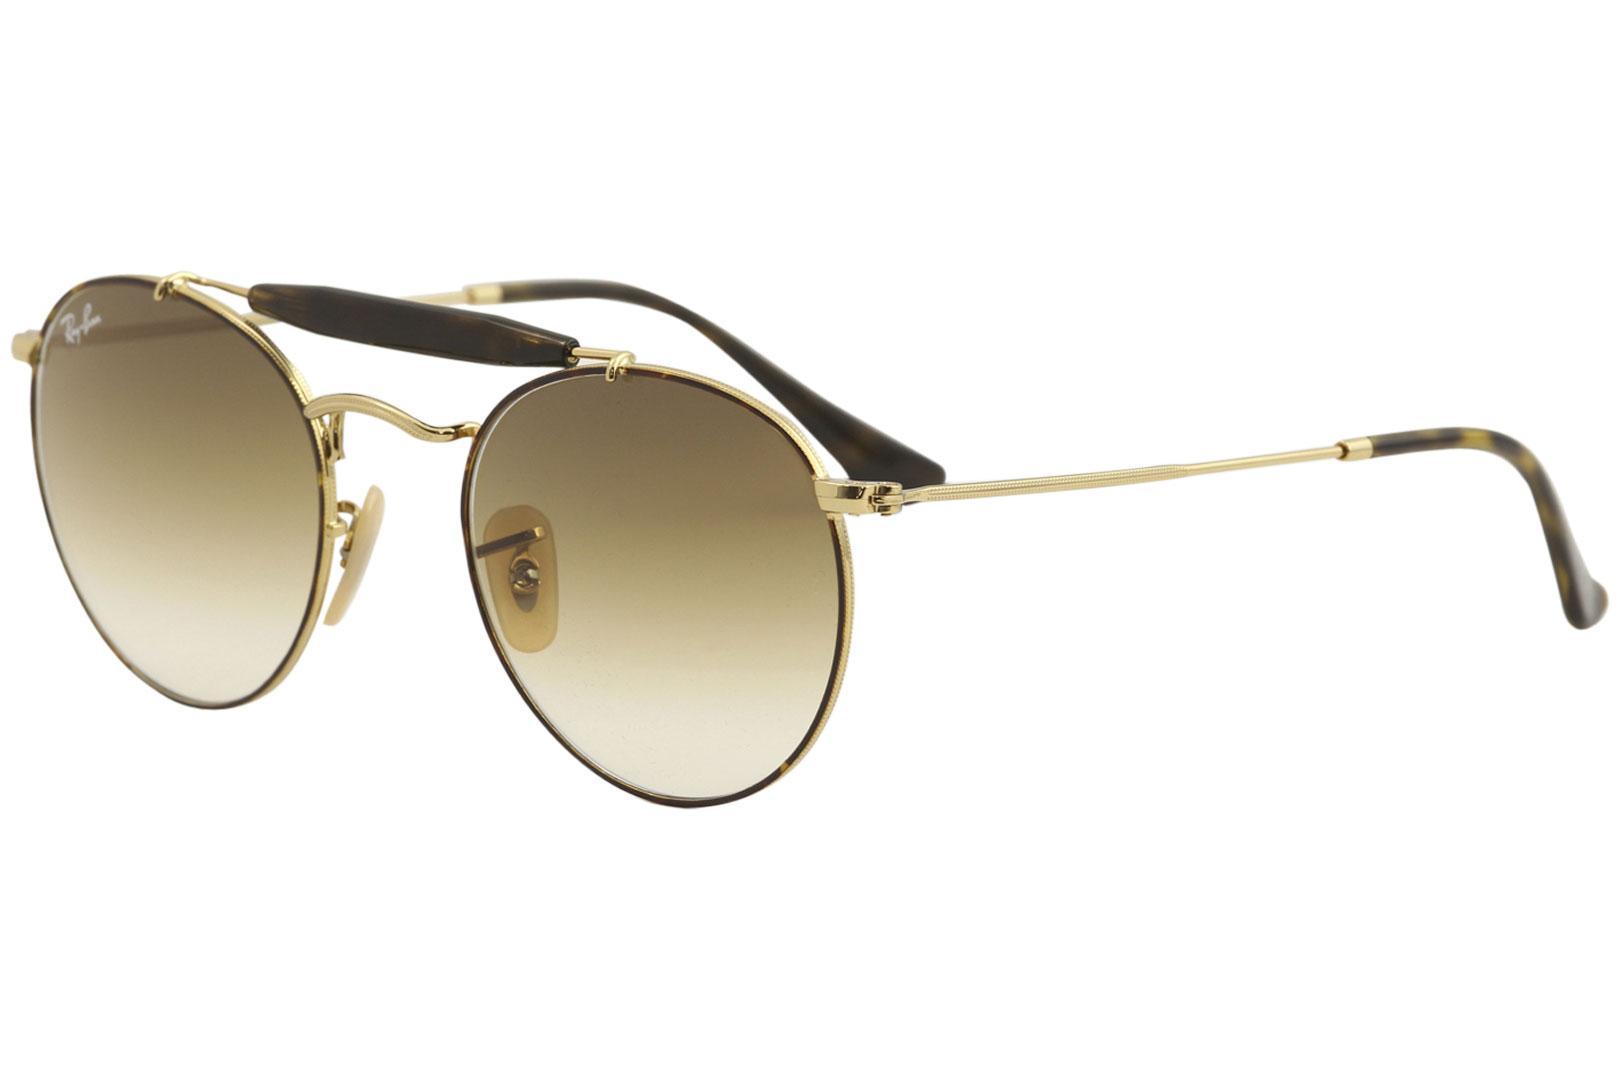 aa4b4c902b Ray Ban RB3747 RB 3747 RayBan 9008 51 Fashion Pilot Sunglasses